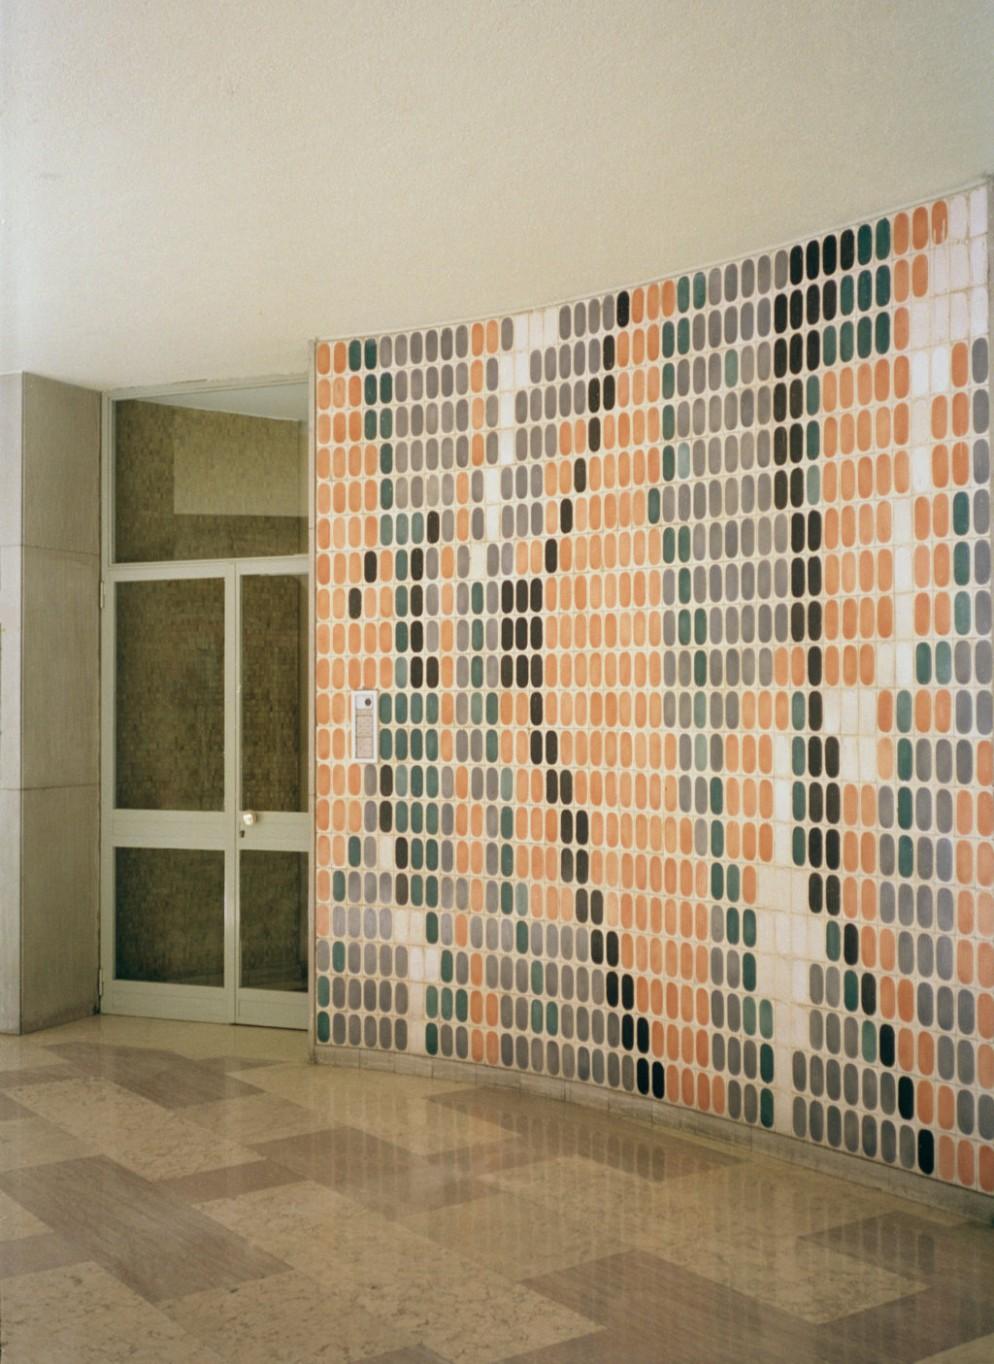 milano-architettura-059 -ph_stefan-giftthaler-livingcorriere